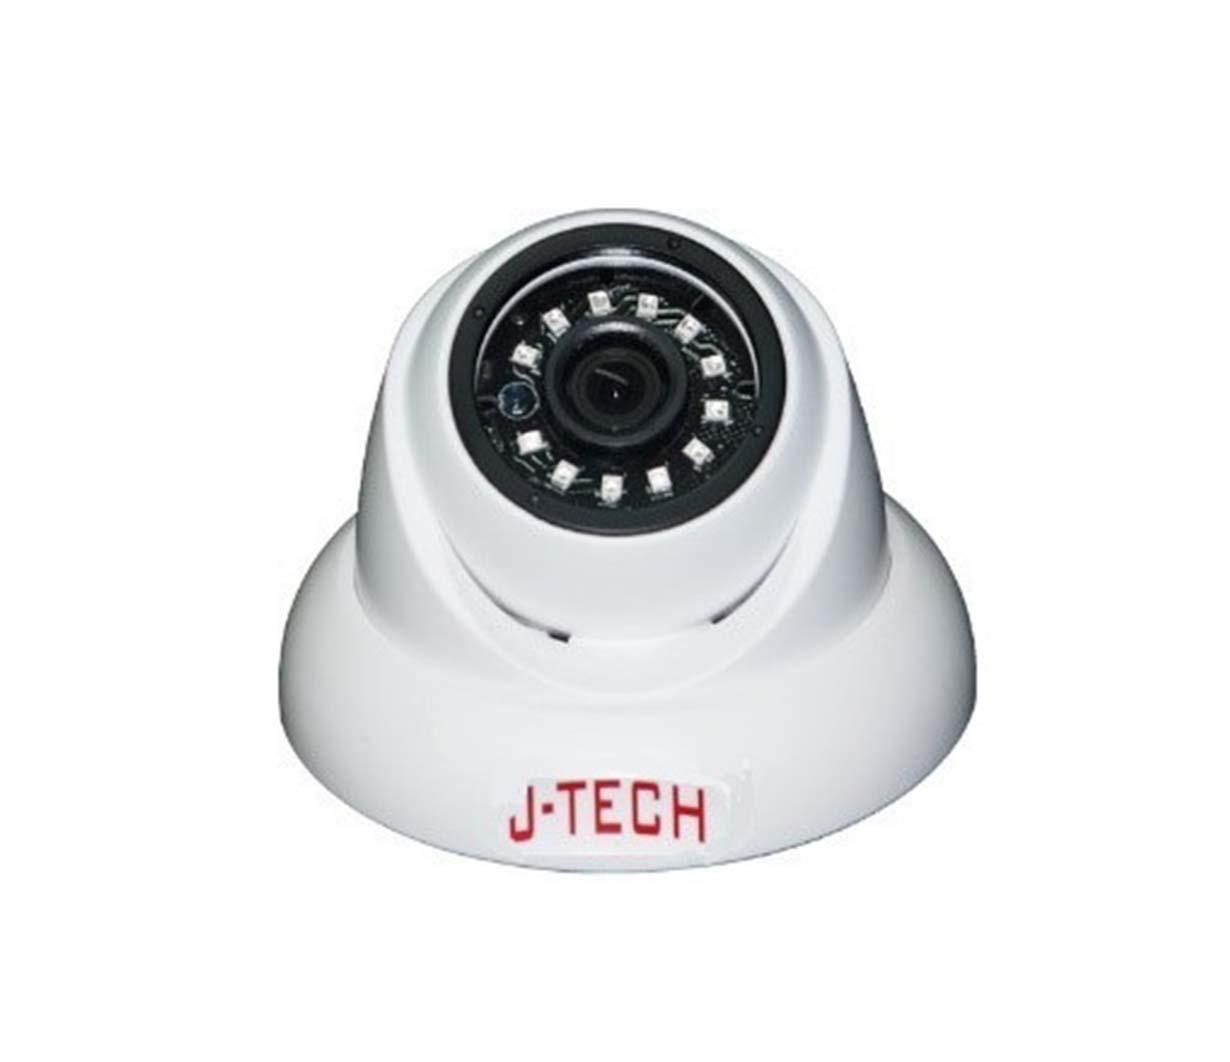 J-TECH AHD5220 DOME 1~4MP CMOS